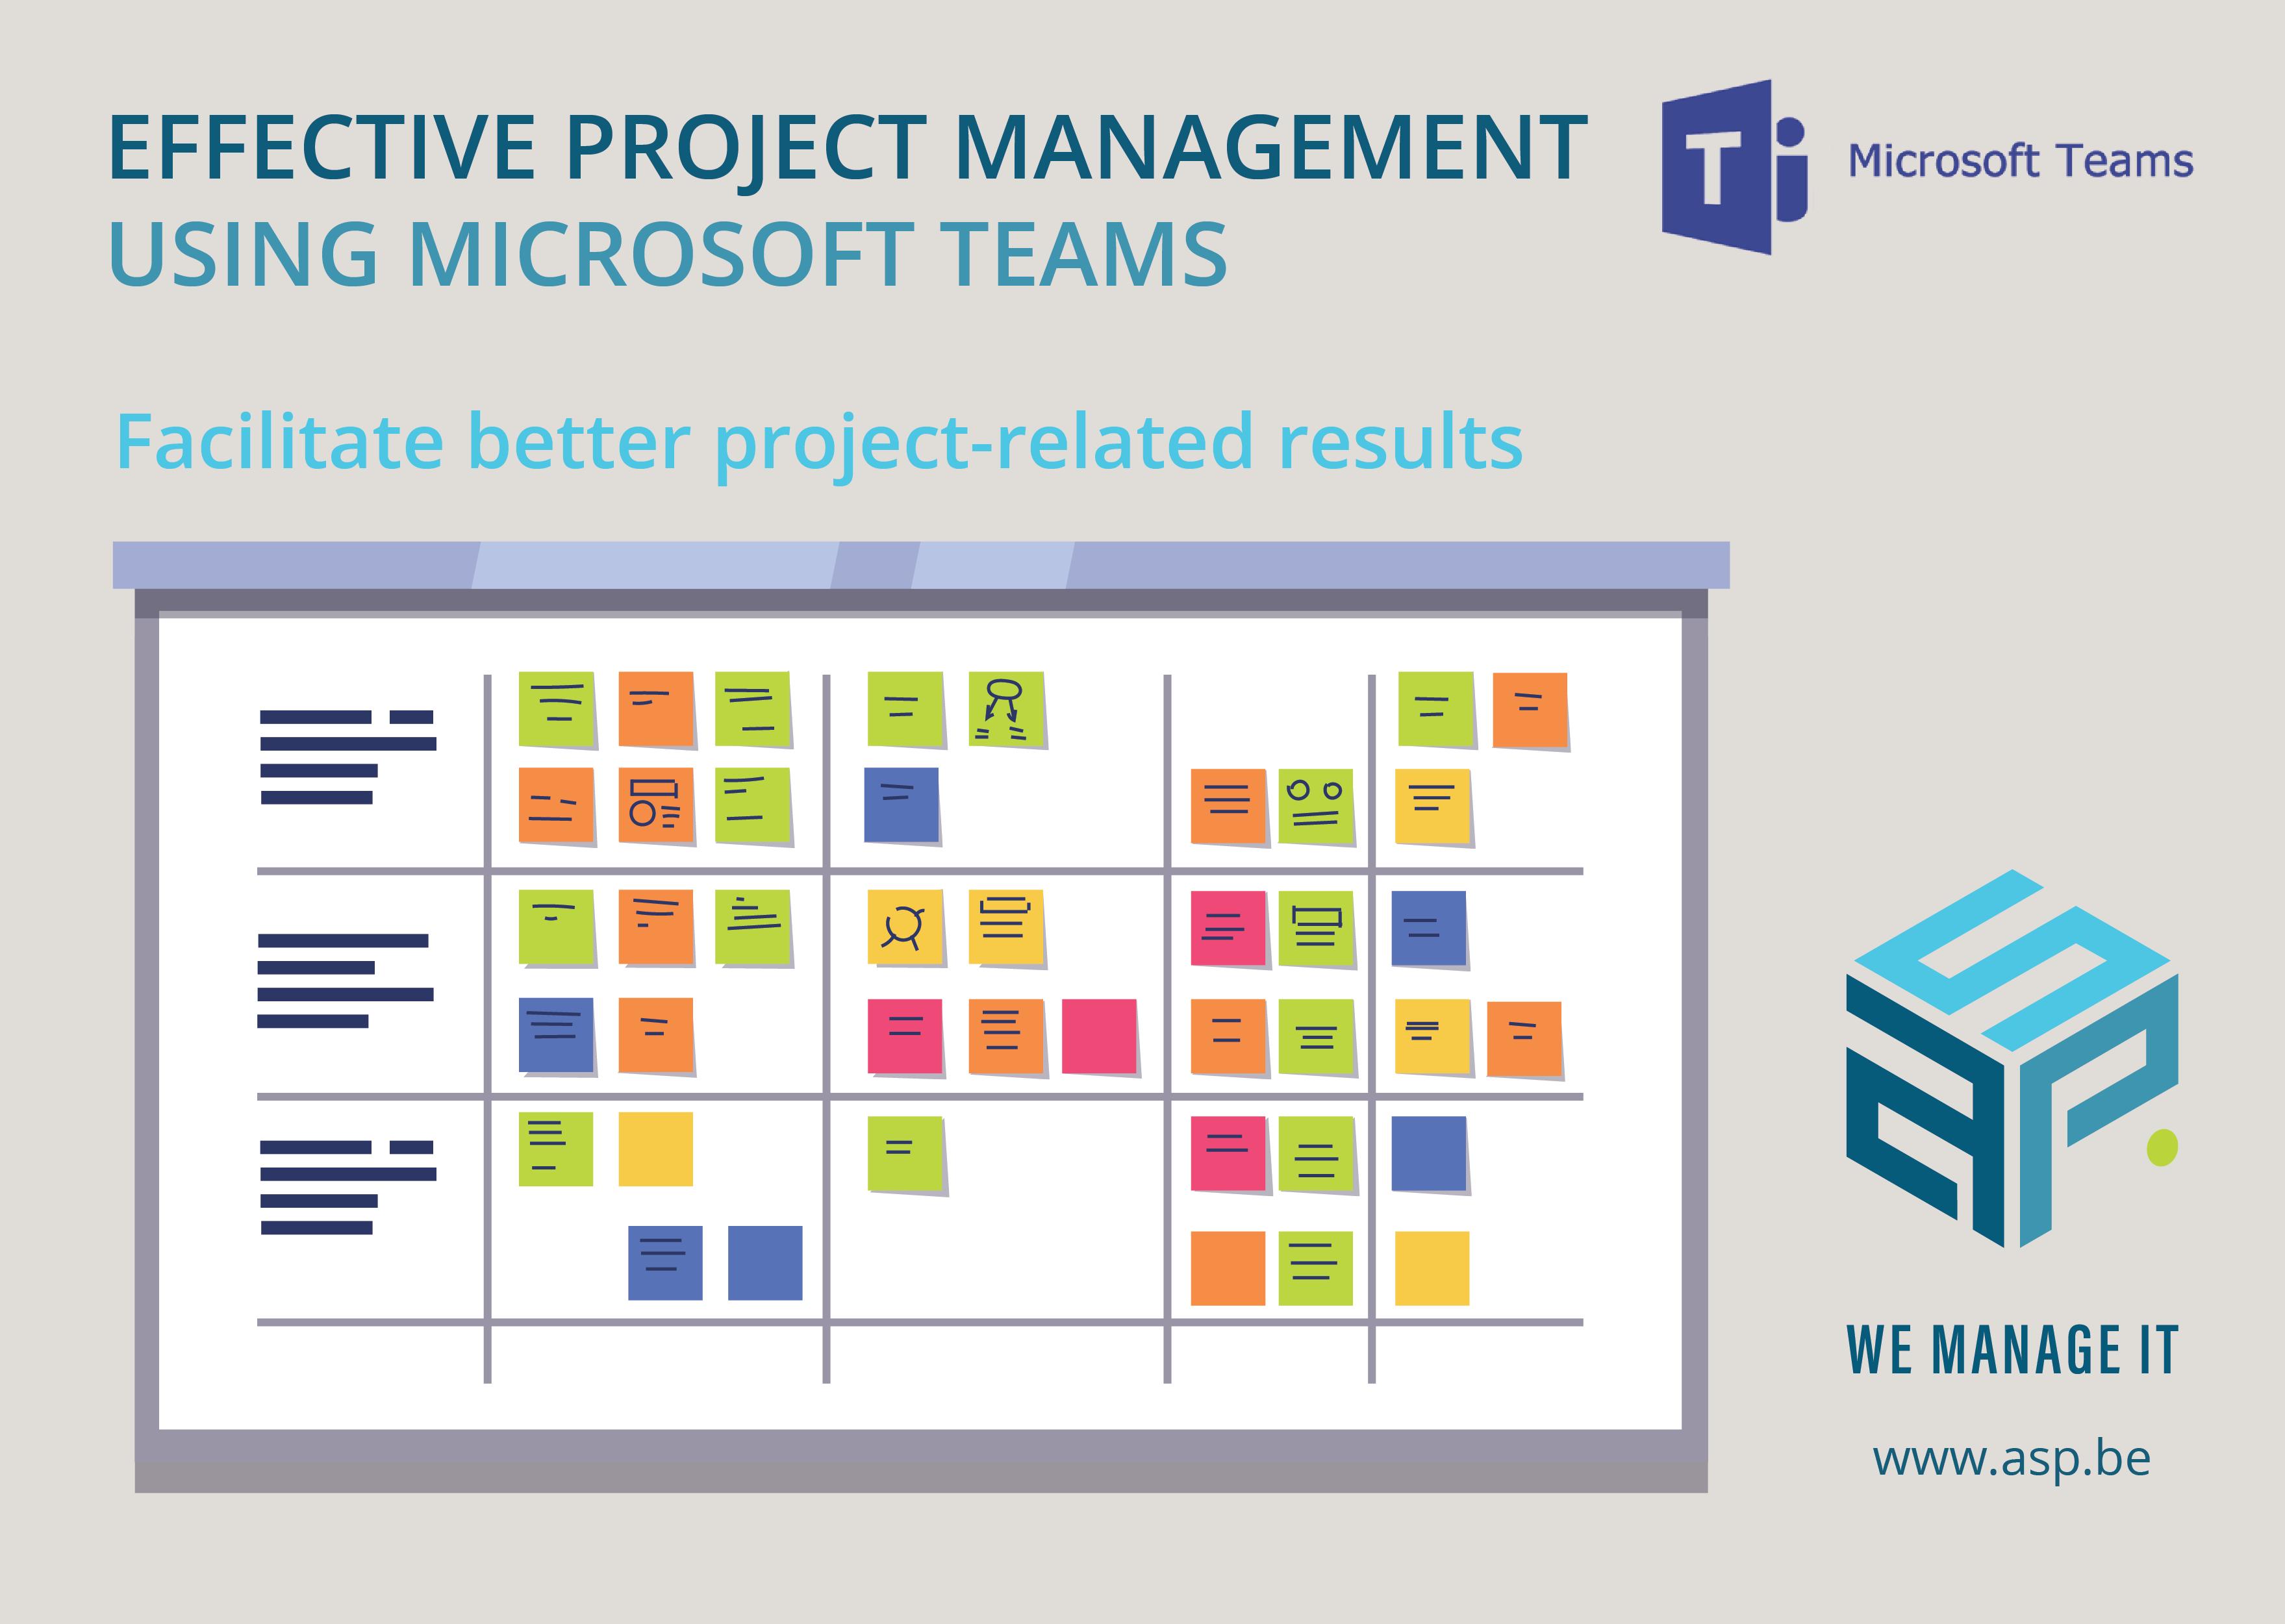 Webinar: Effective Project Management using Microsoft Teams by Piet Vermeir